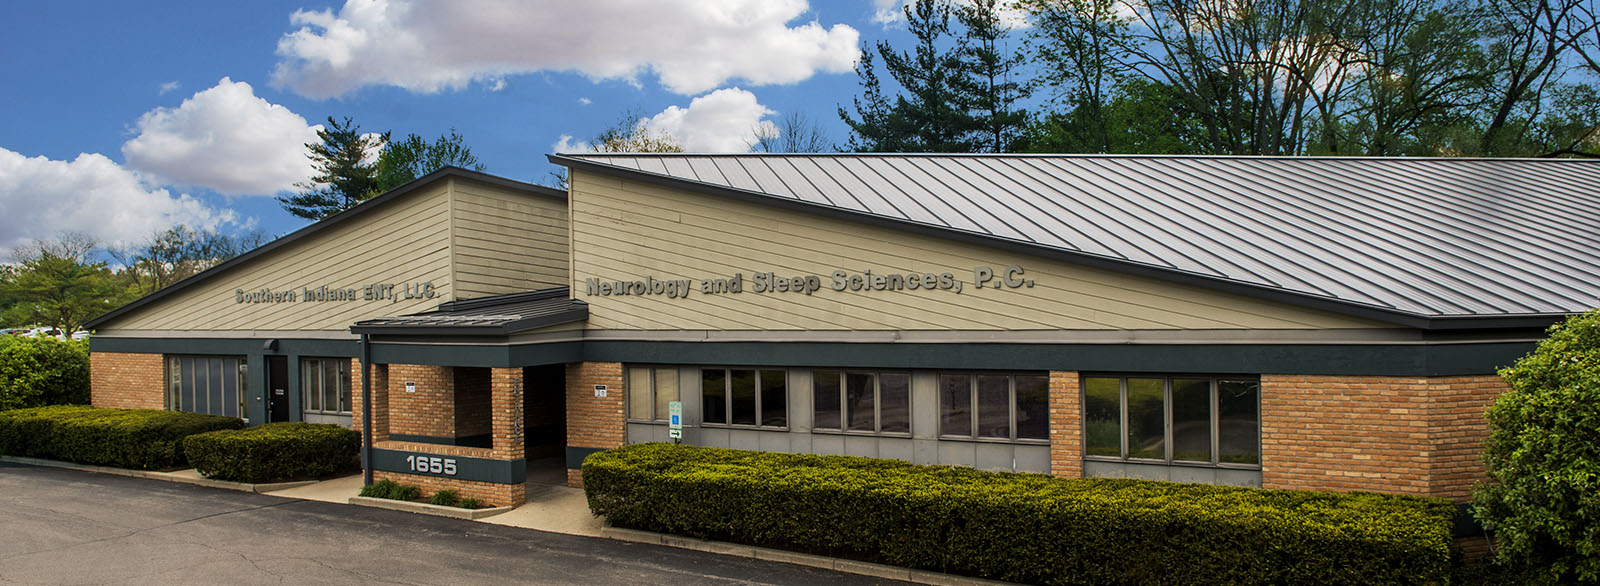 Neurology and Sleep Sciences building exterior